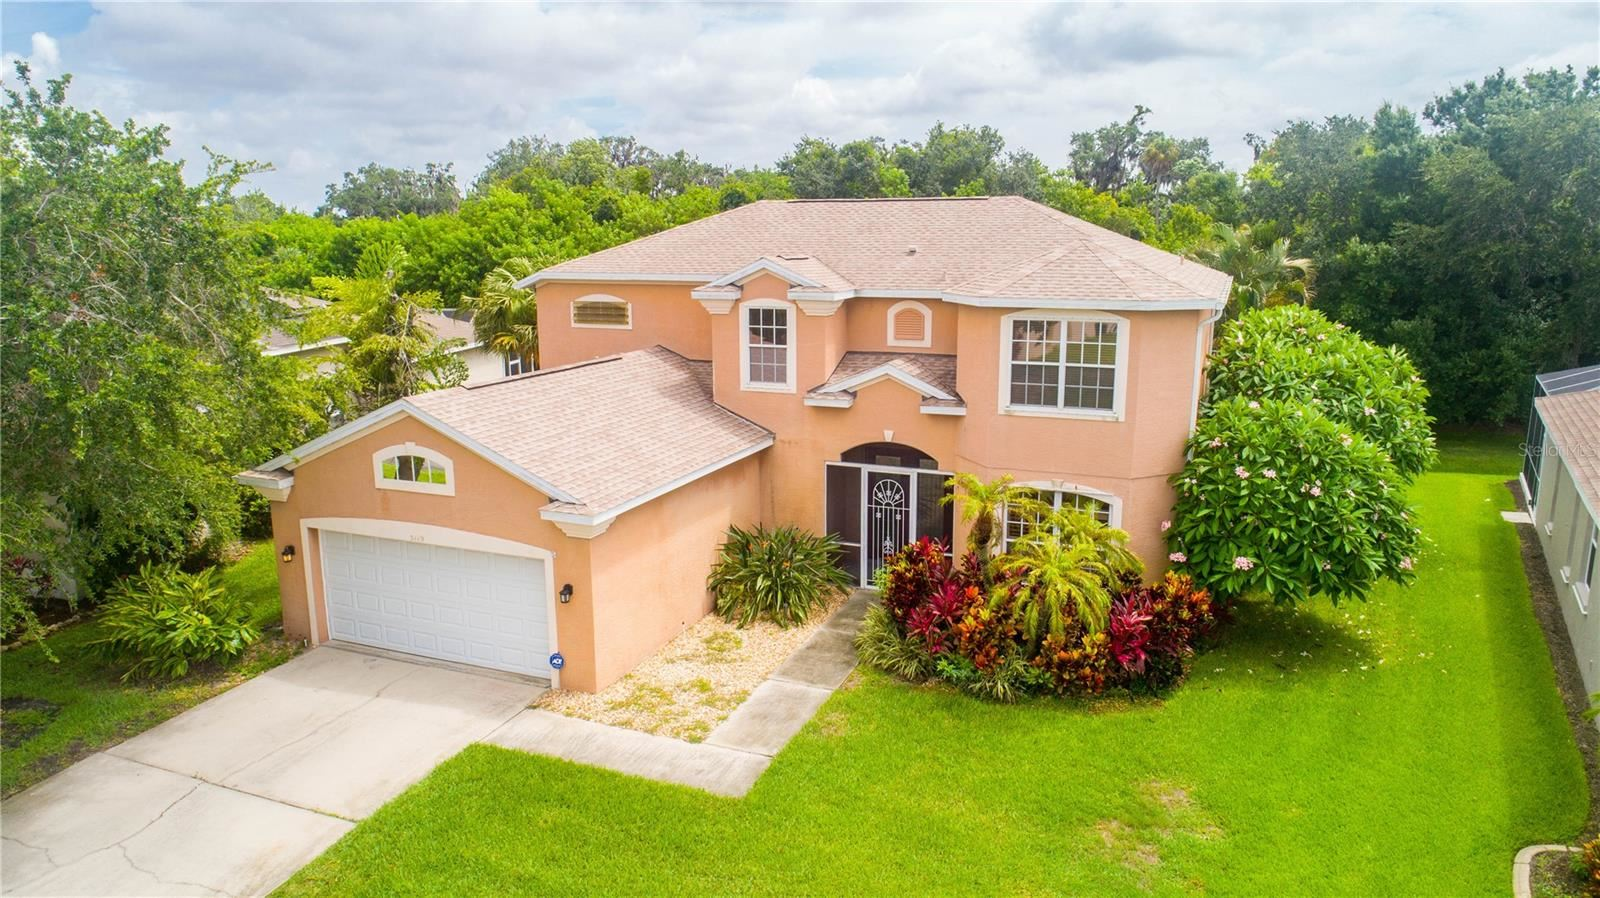 Photo of 5119 51ST LANE W, BRADENTON, FL 34210 (MLS # T3313992)